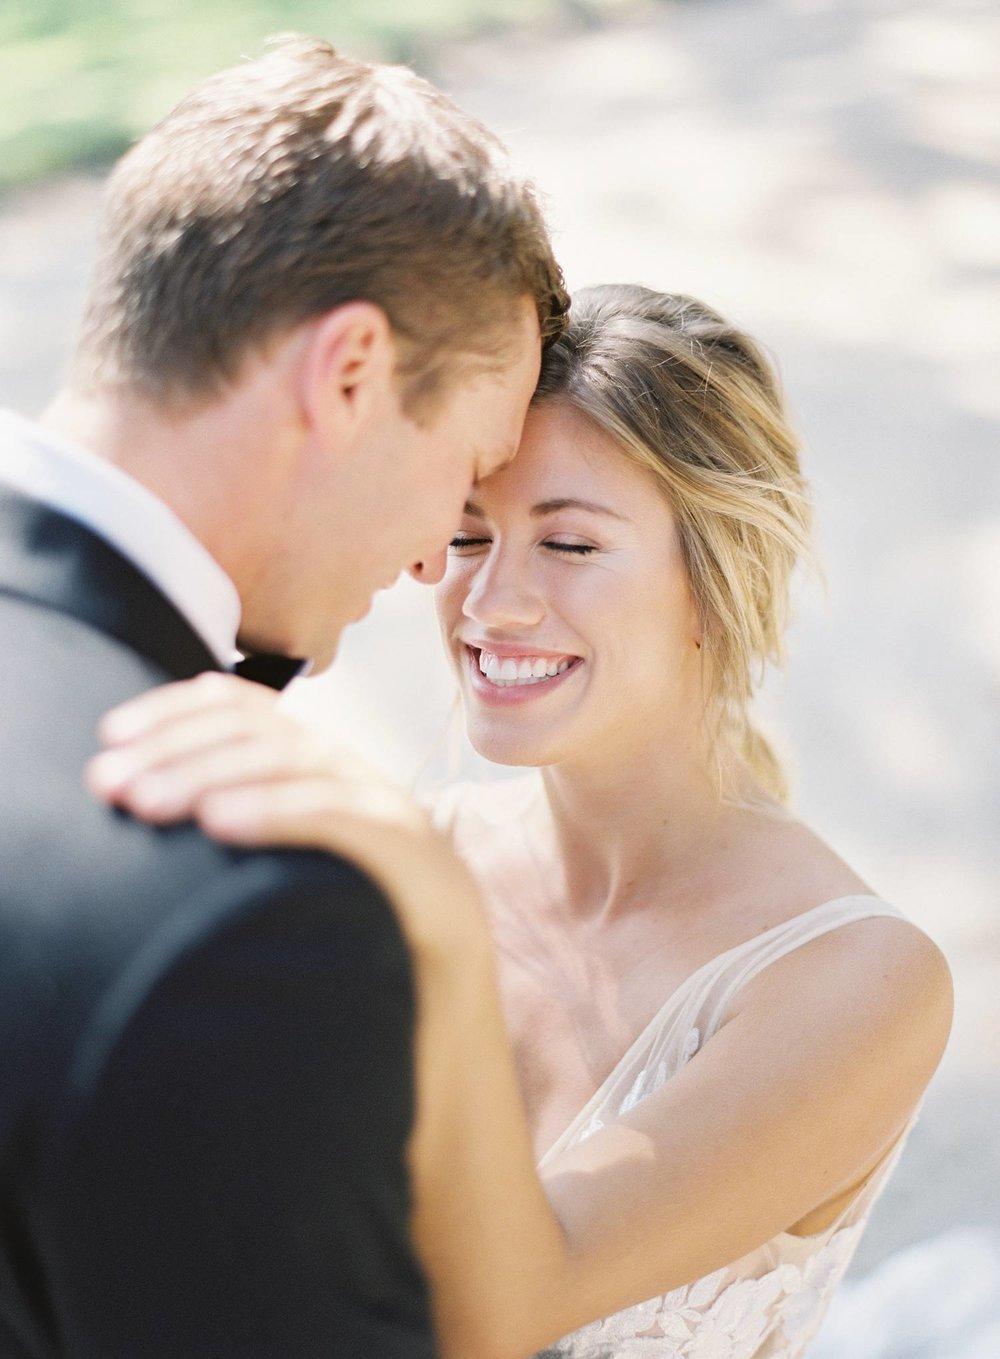 boonehallplantation_wedding_32.jpg